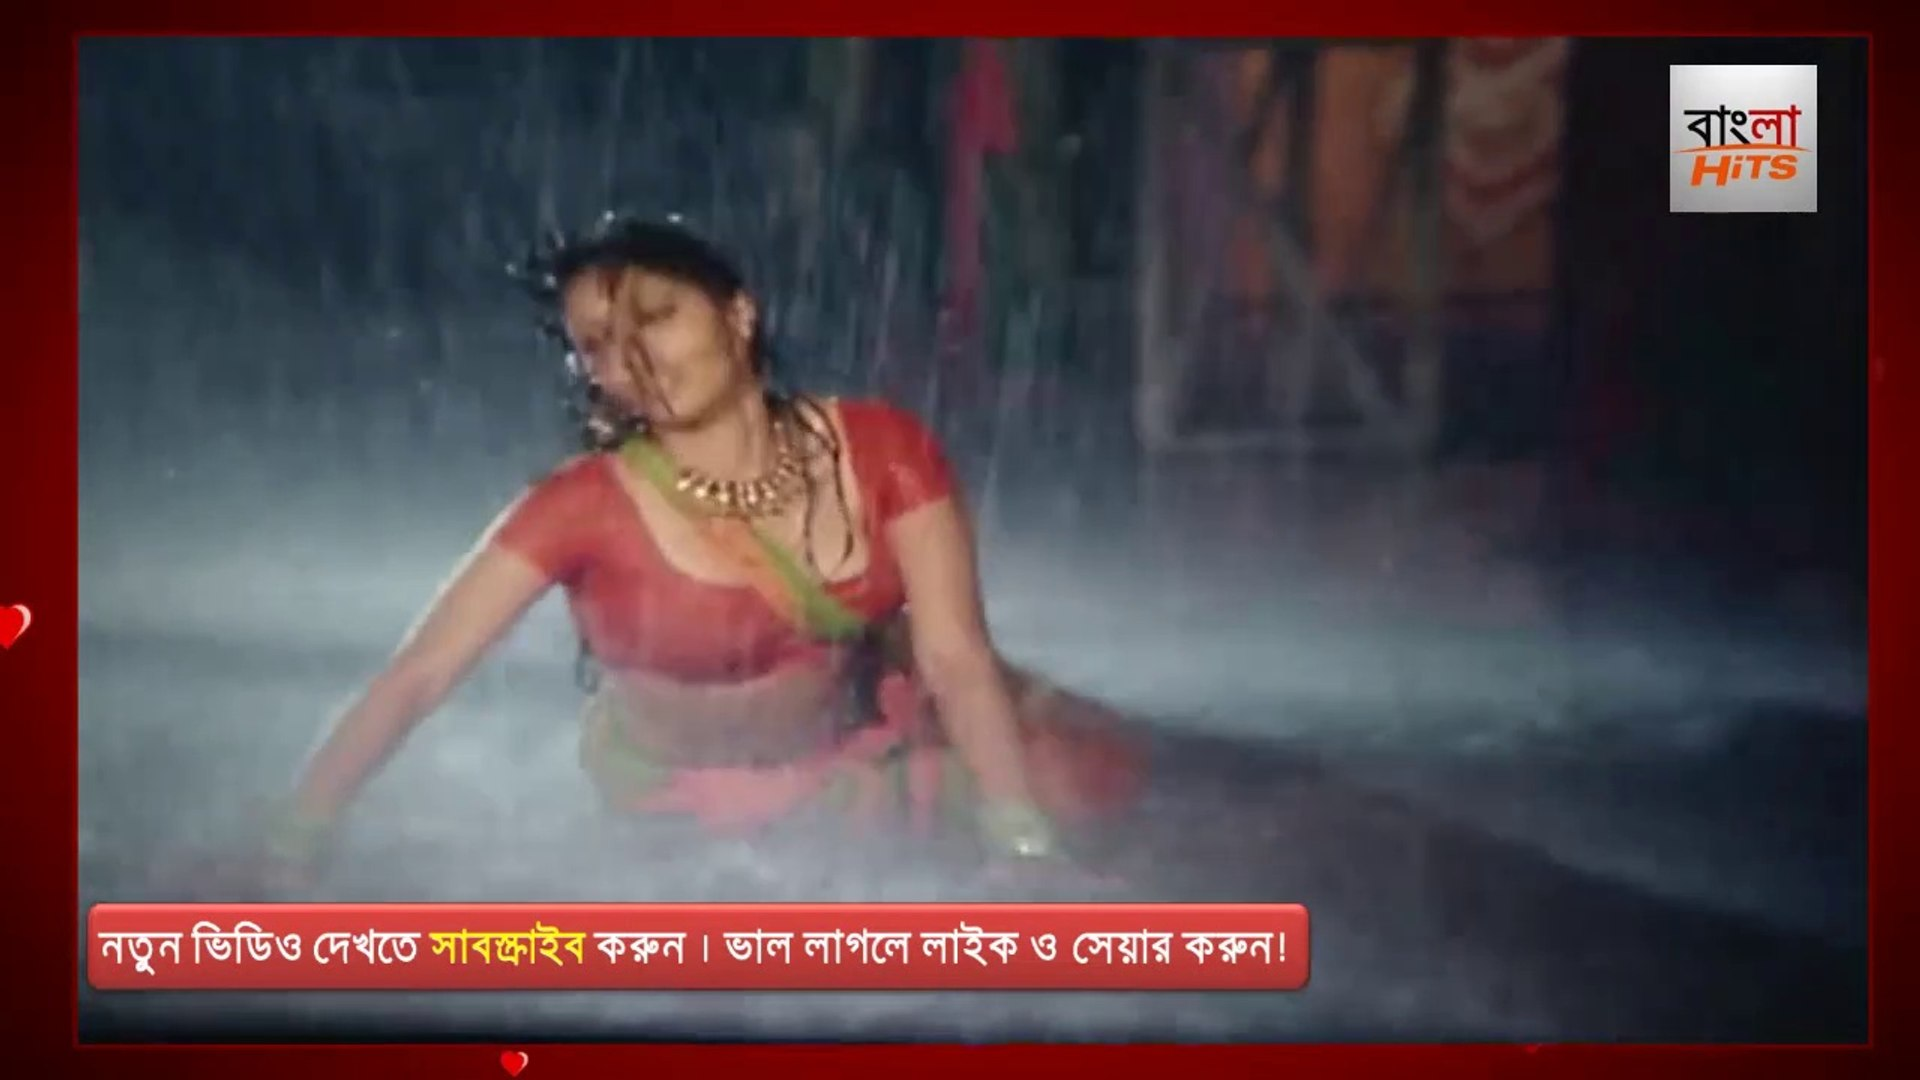 Bangla HITz Music: Beautiful Bangladeshi Actress Keya Unseen Super Hot wet Song HD  | Rain Dance on